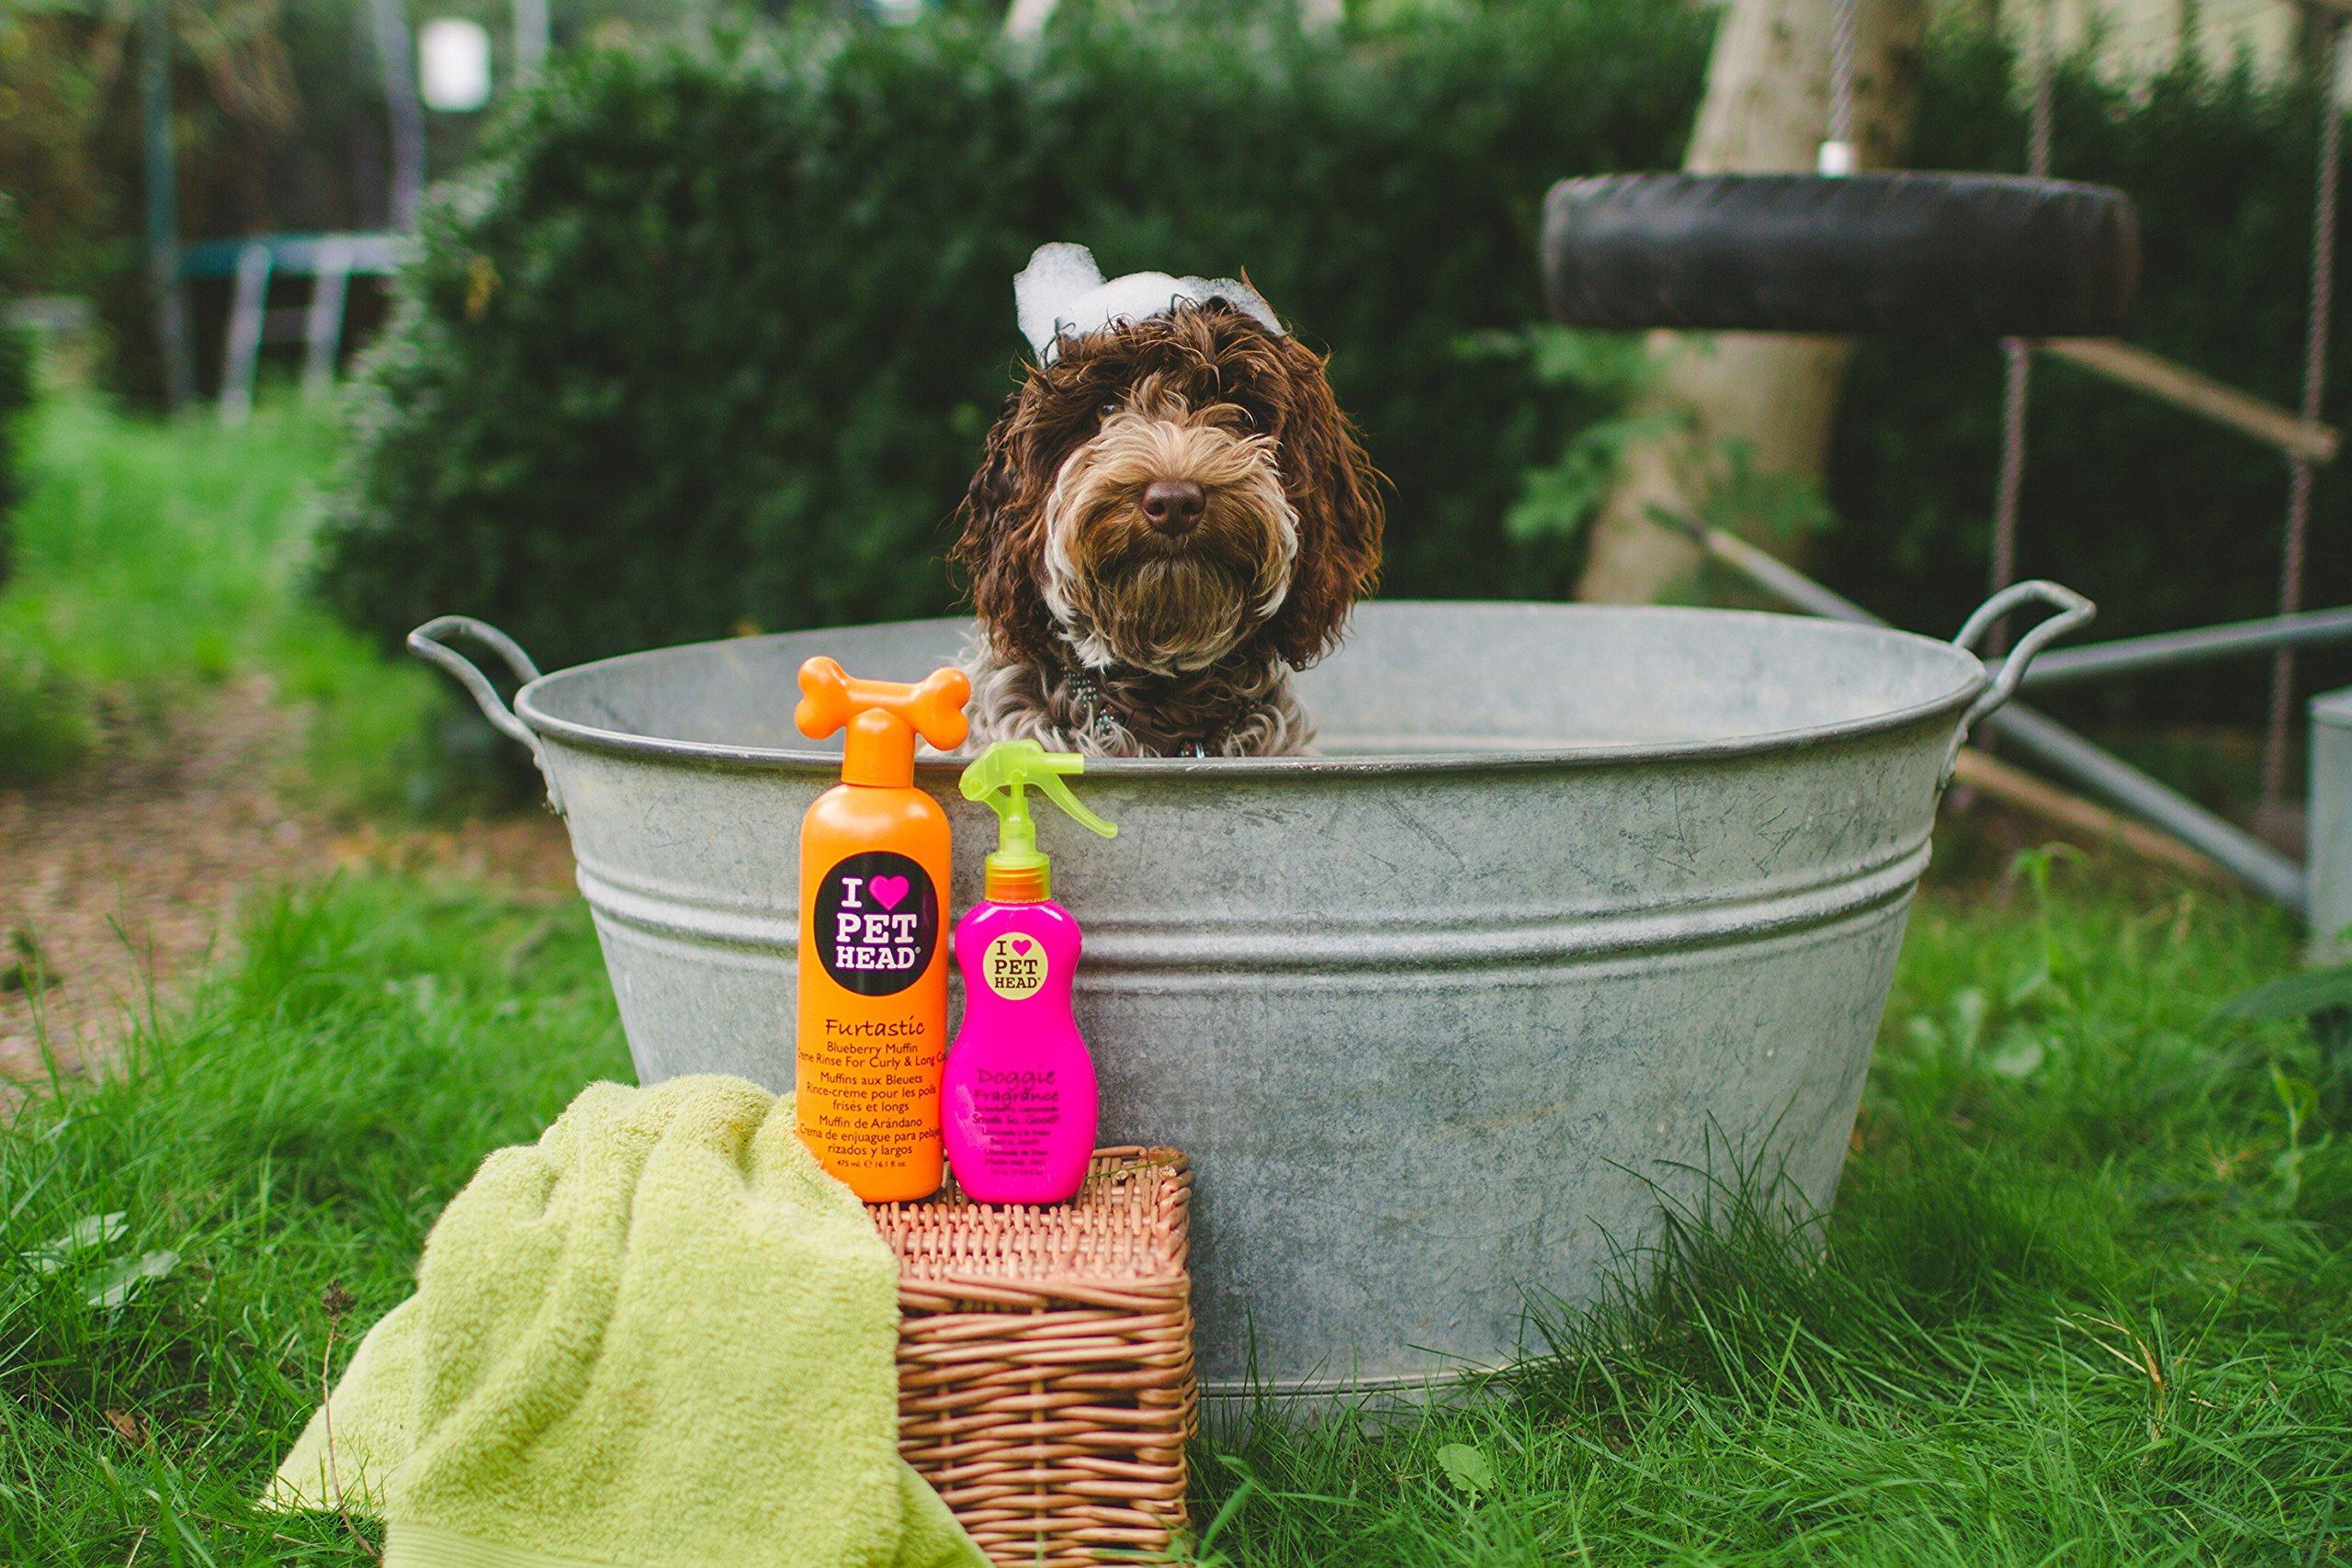 Pet Head Fur Ball Detangling Spray for Pets Strawberry Yogurt -- 15.2 fl oz by The Company of Animals (Image #5)